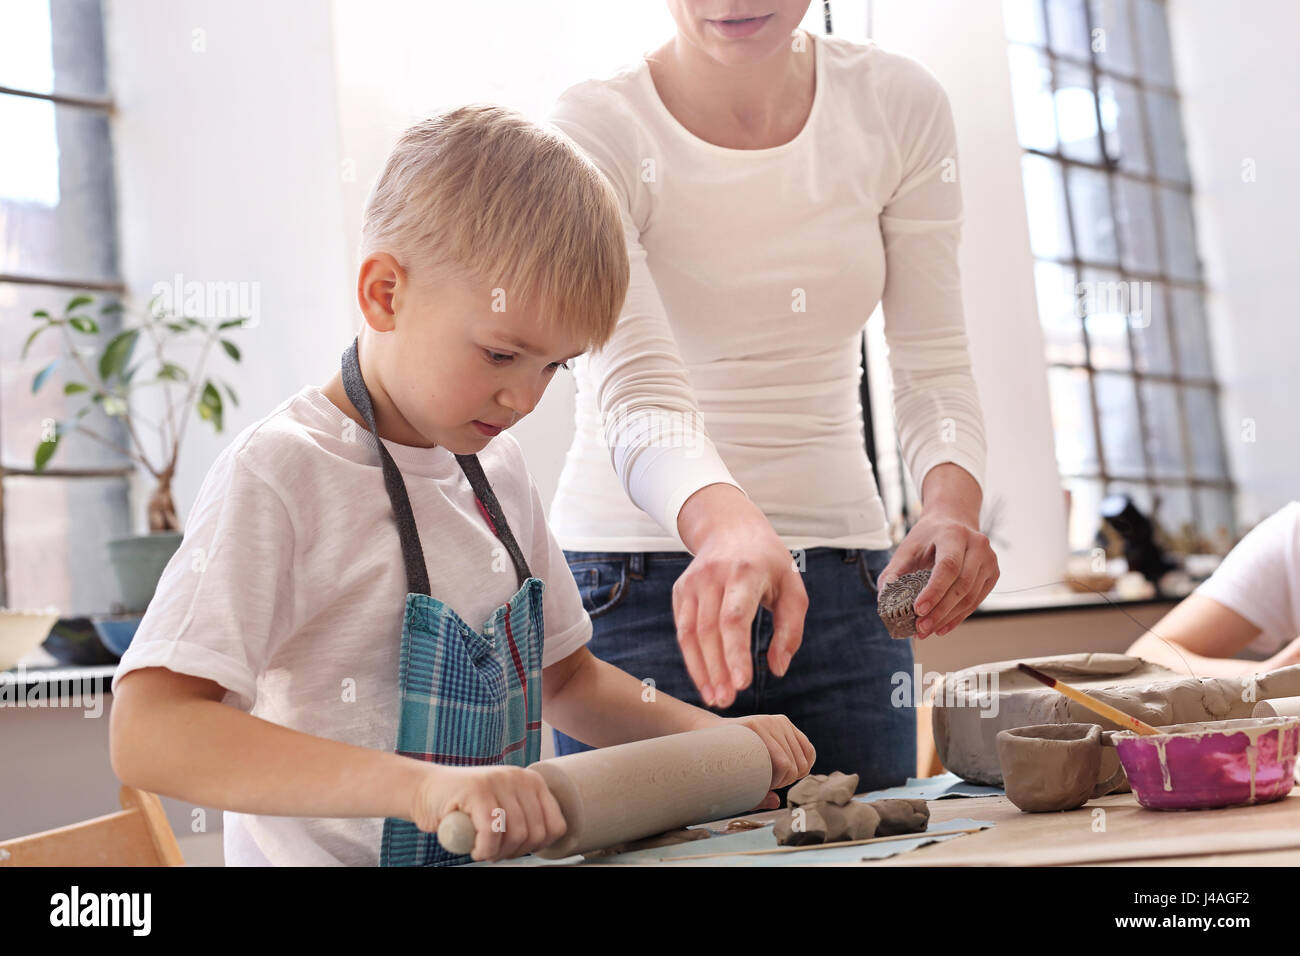 Extracurricular activities, ceramics. Animation classes for children, ceramics and clay - Stock Image